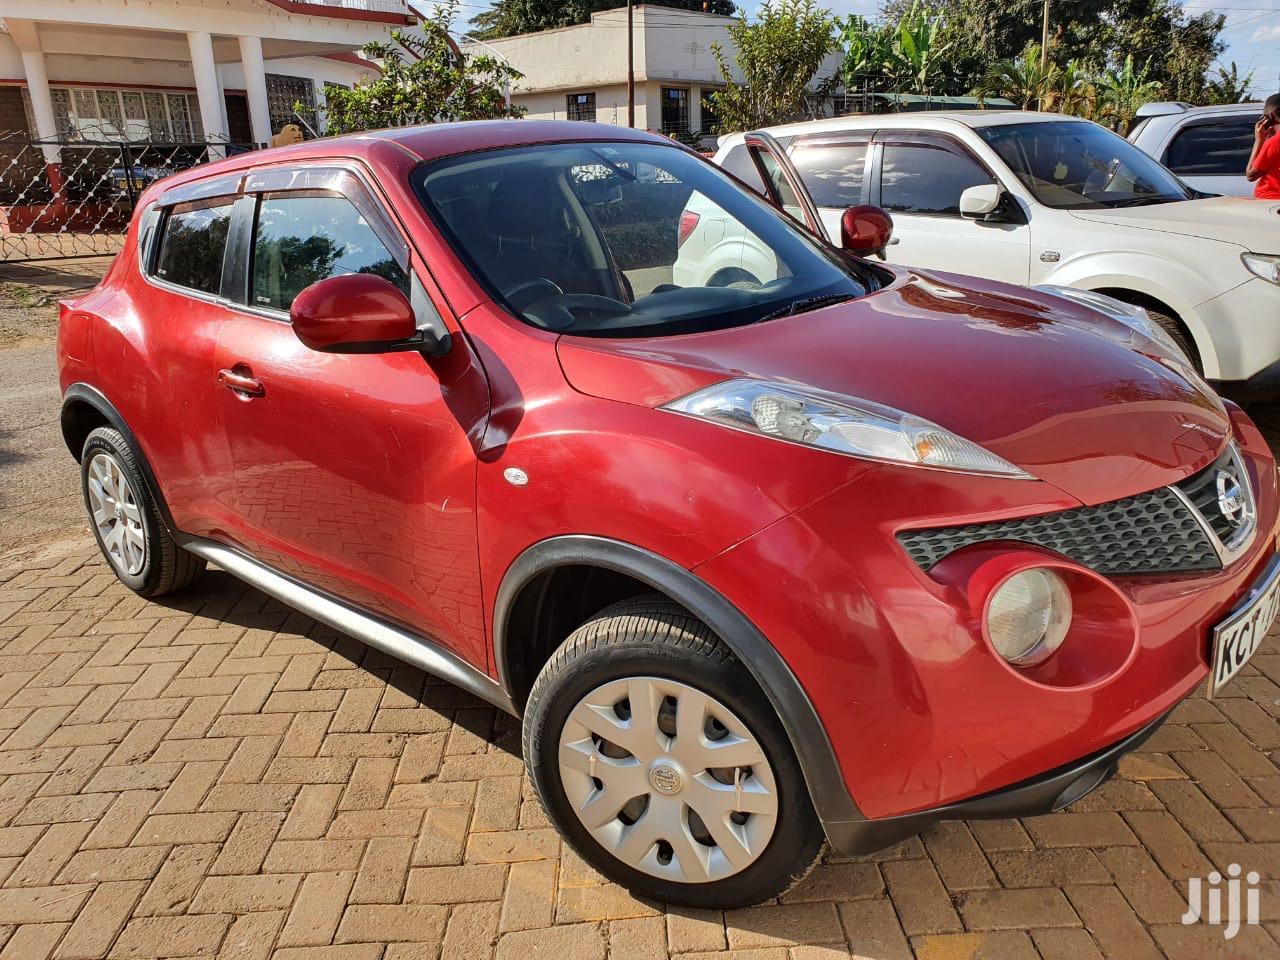 Nissan Juke 2013 Red | Cars for sale in Mvita, Mombasa, Kenya